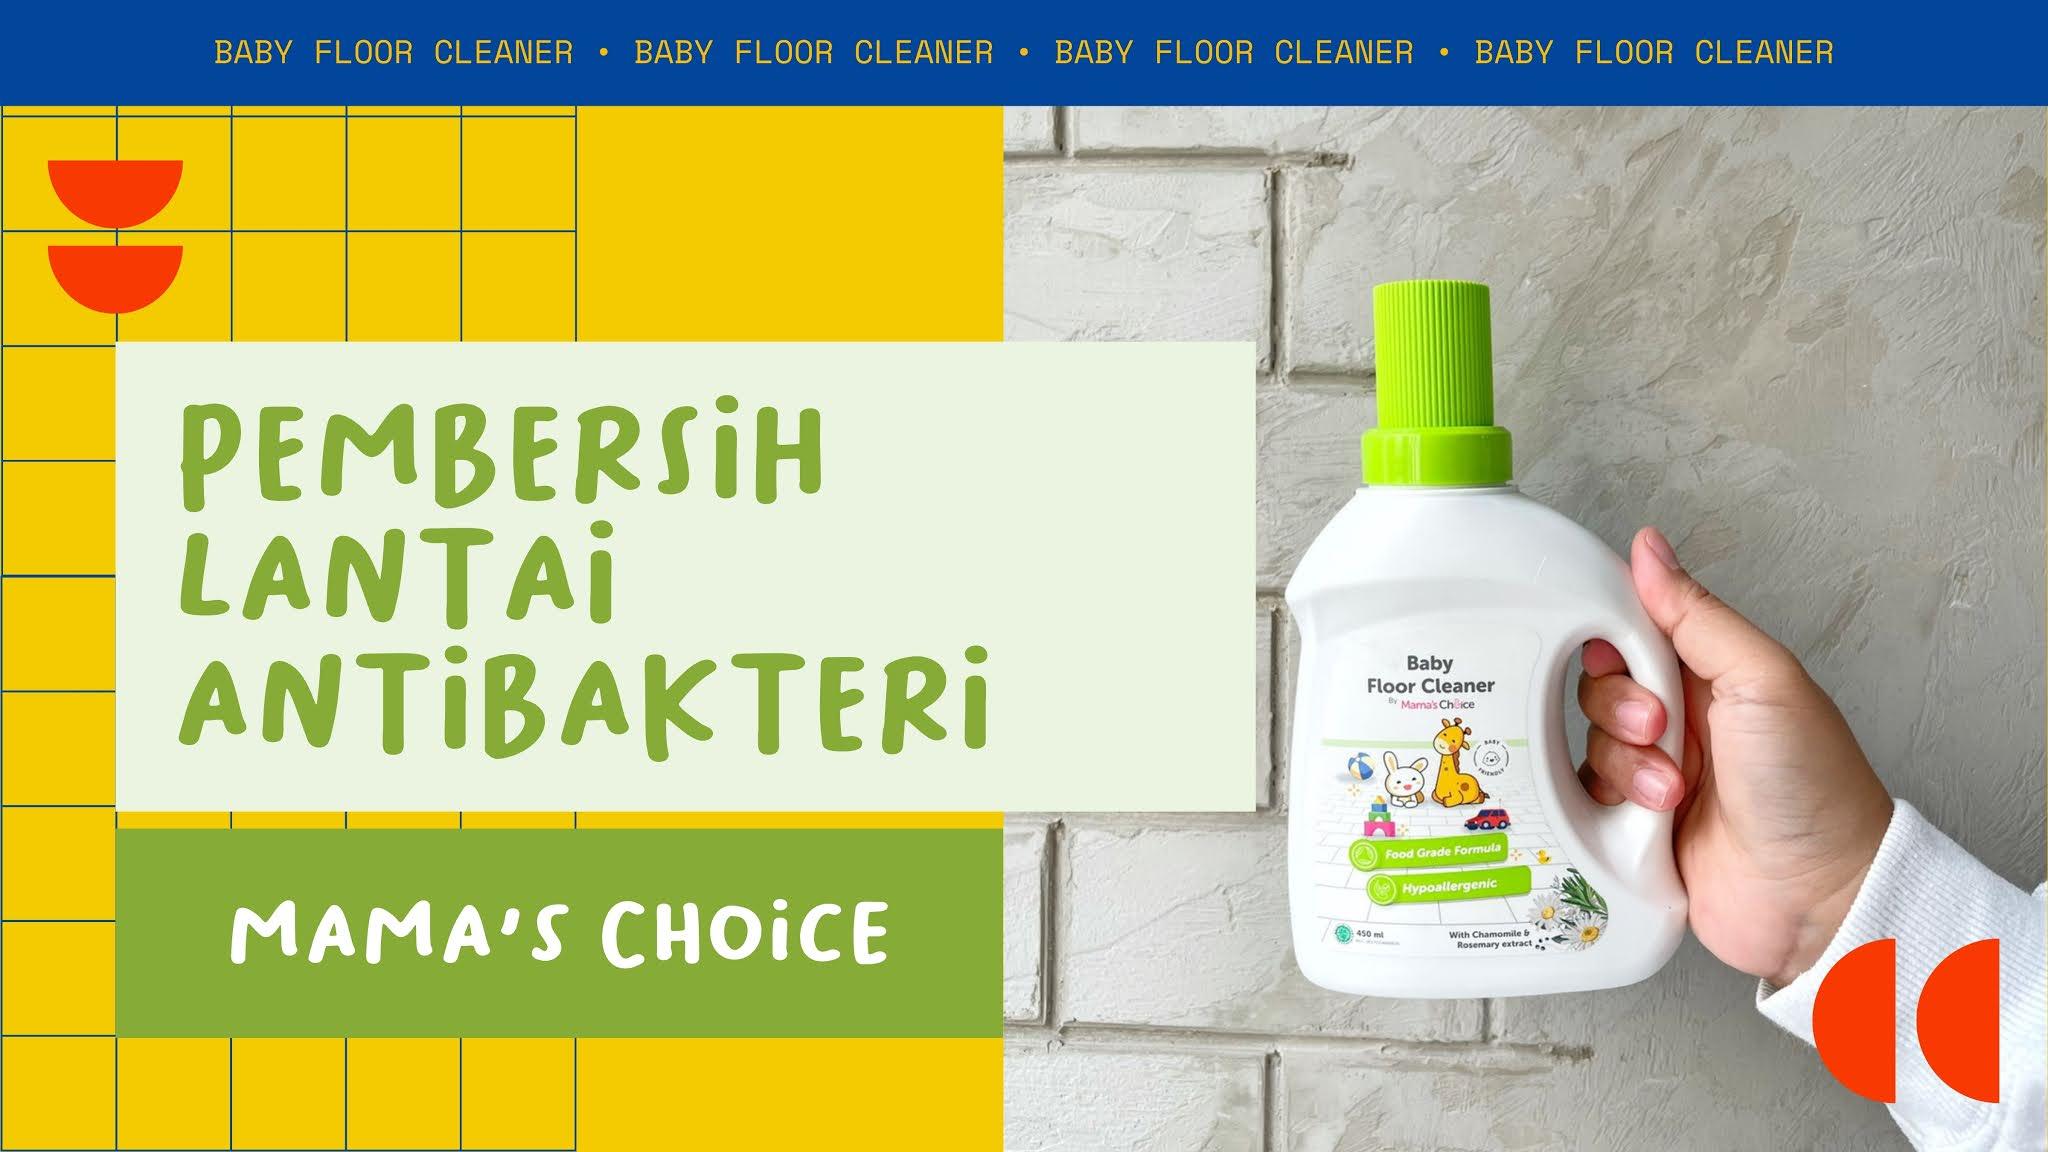 baby floor cleaner mama's choice